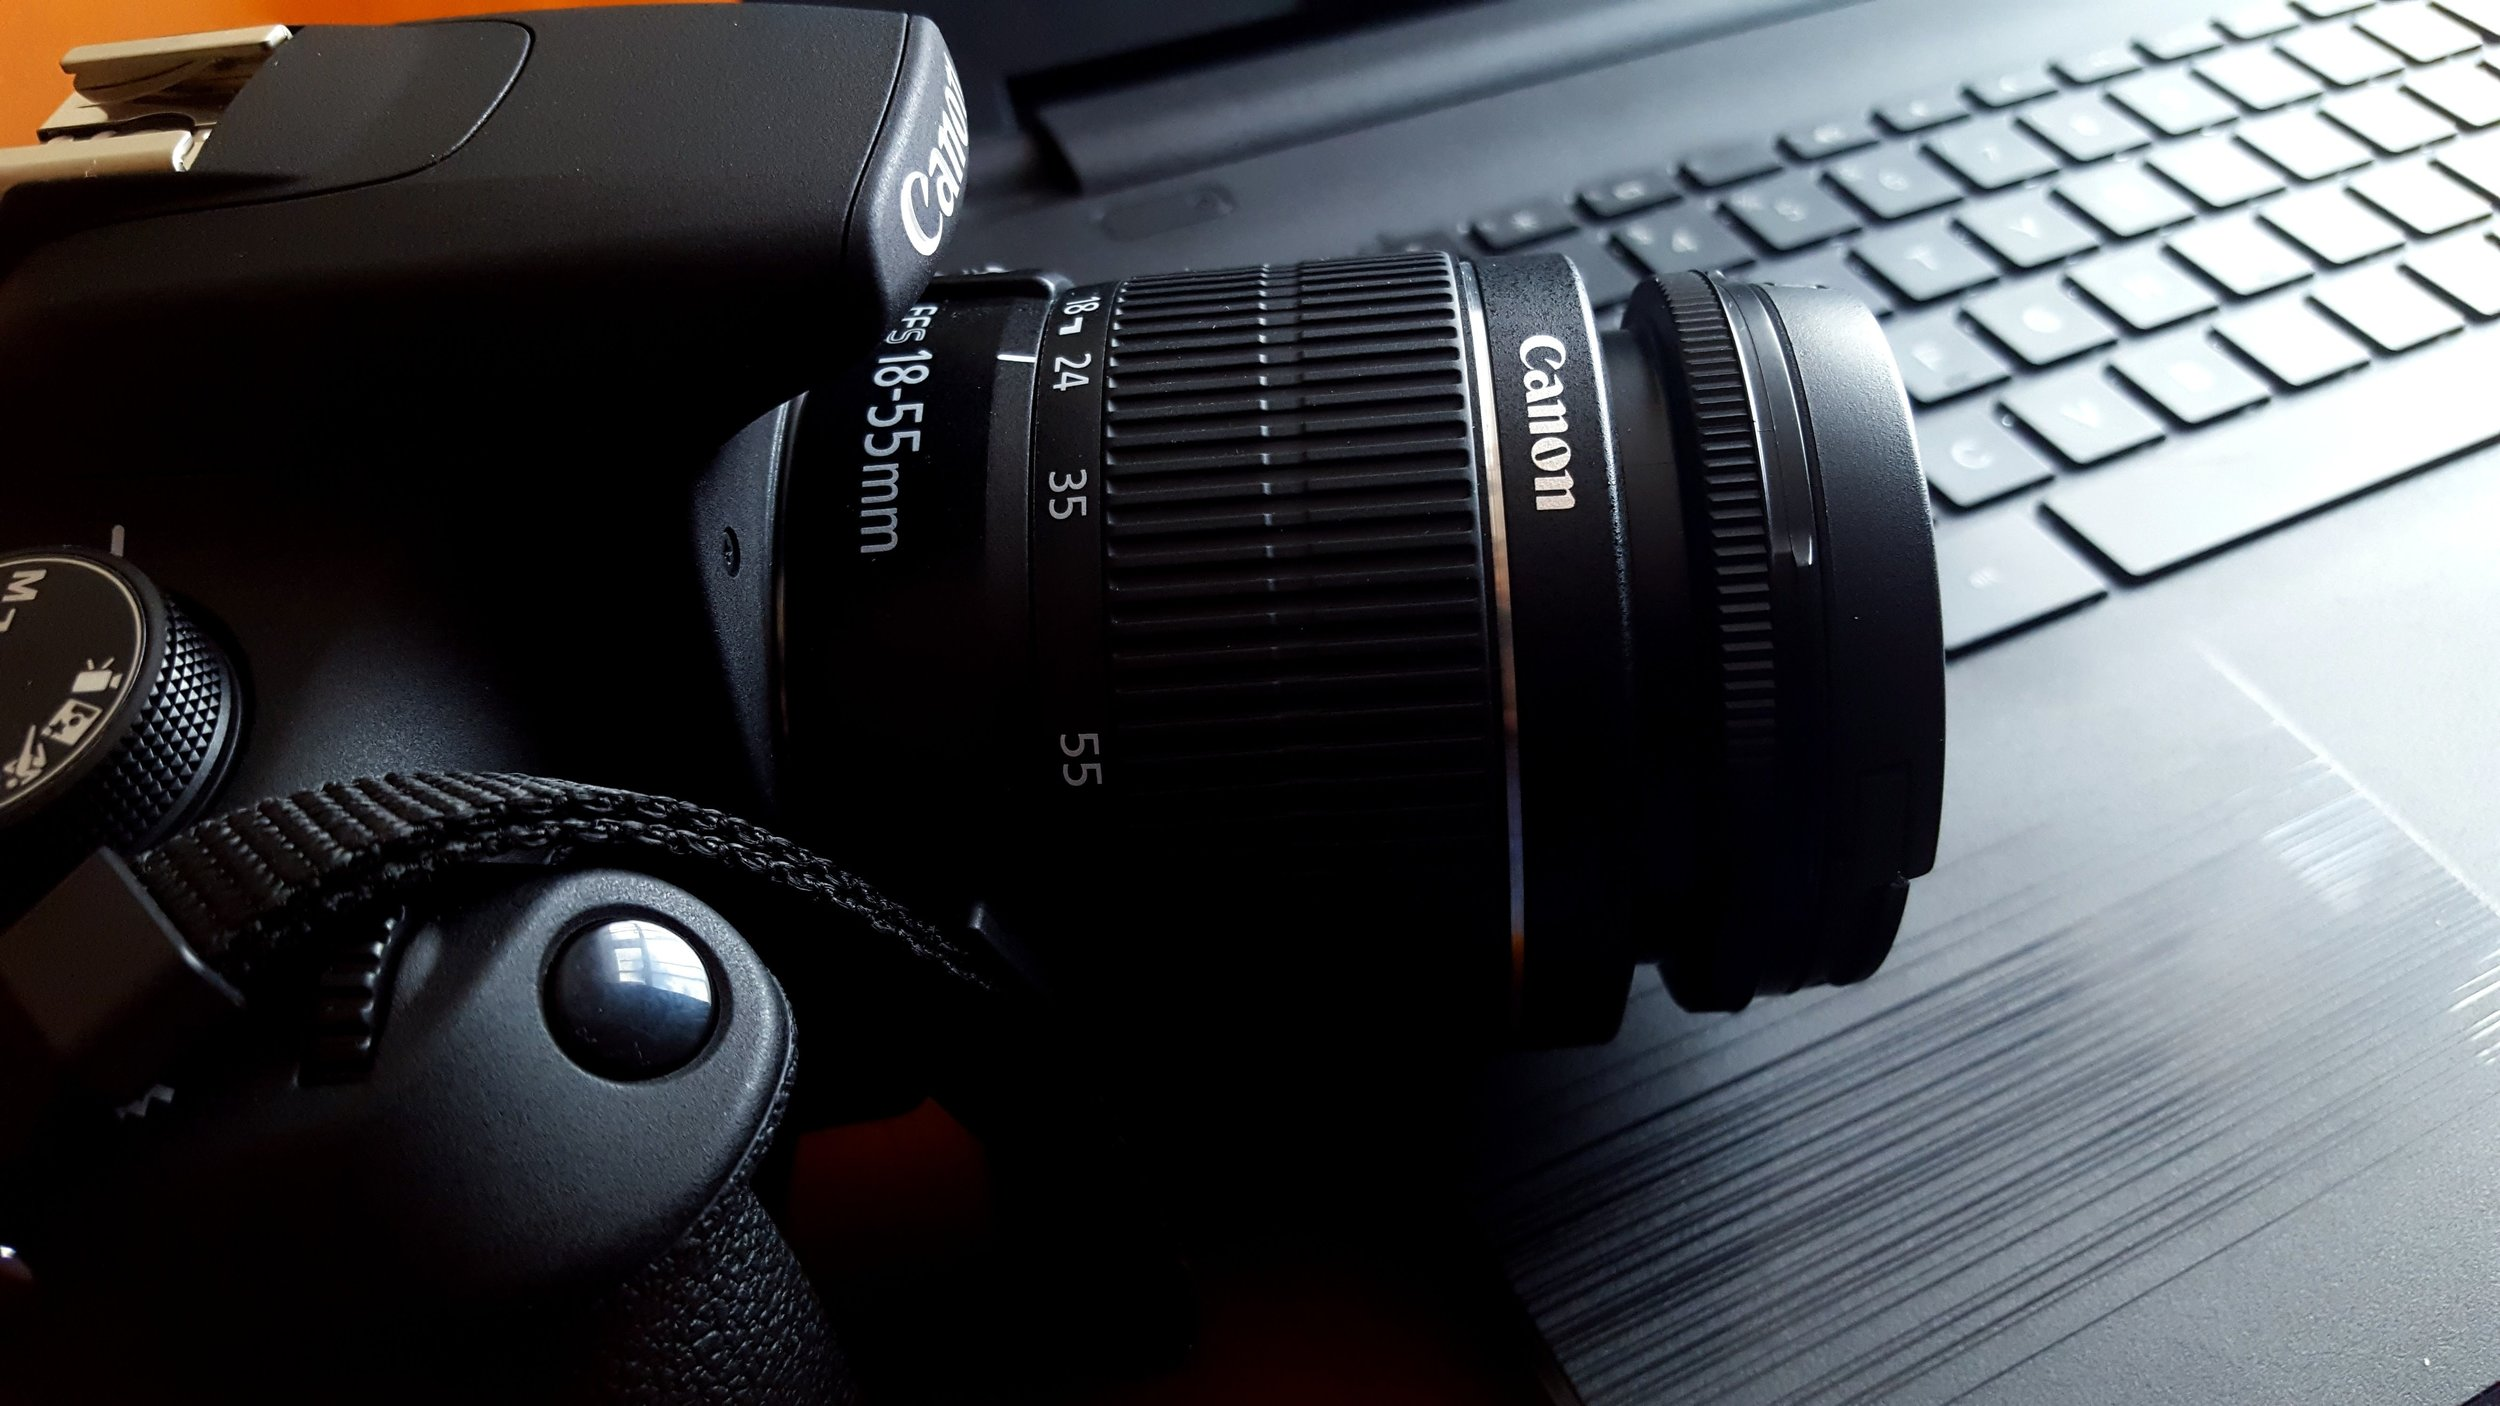 analogue-aperture-business-248519.jpg